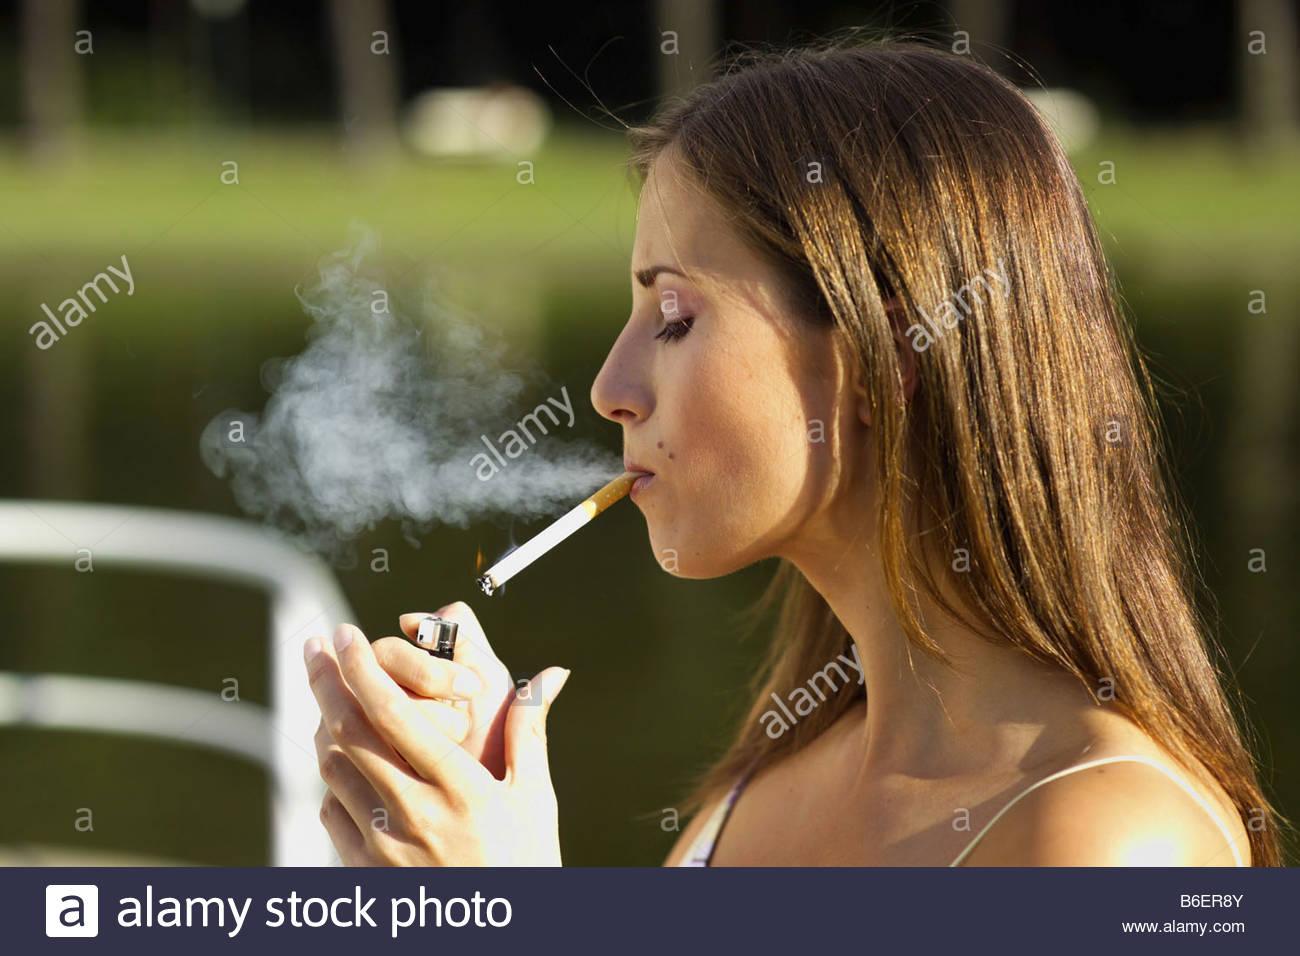 beautiful woman lighting a cigarette  sc 1 st  Alamy & beautiful woman lighting a cigarette Stock Photo Royalty Free ... azcodes.com